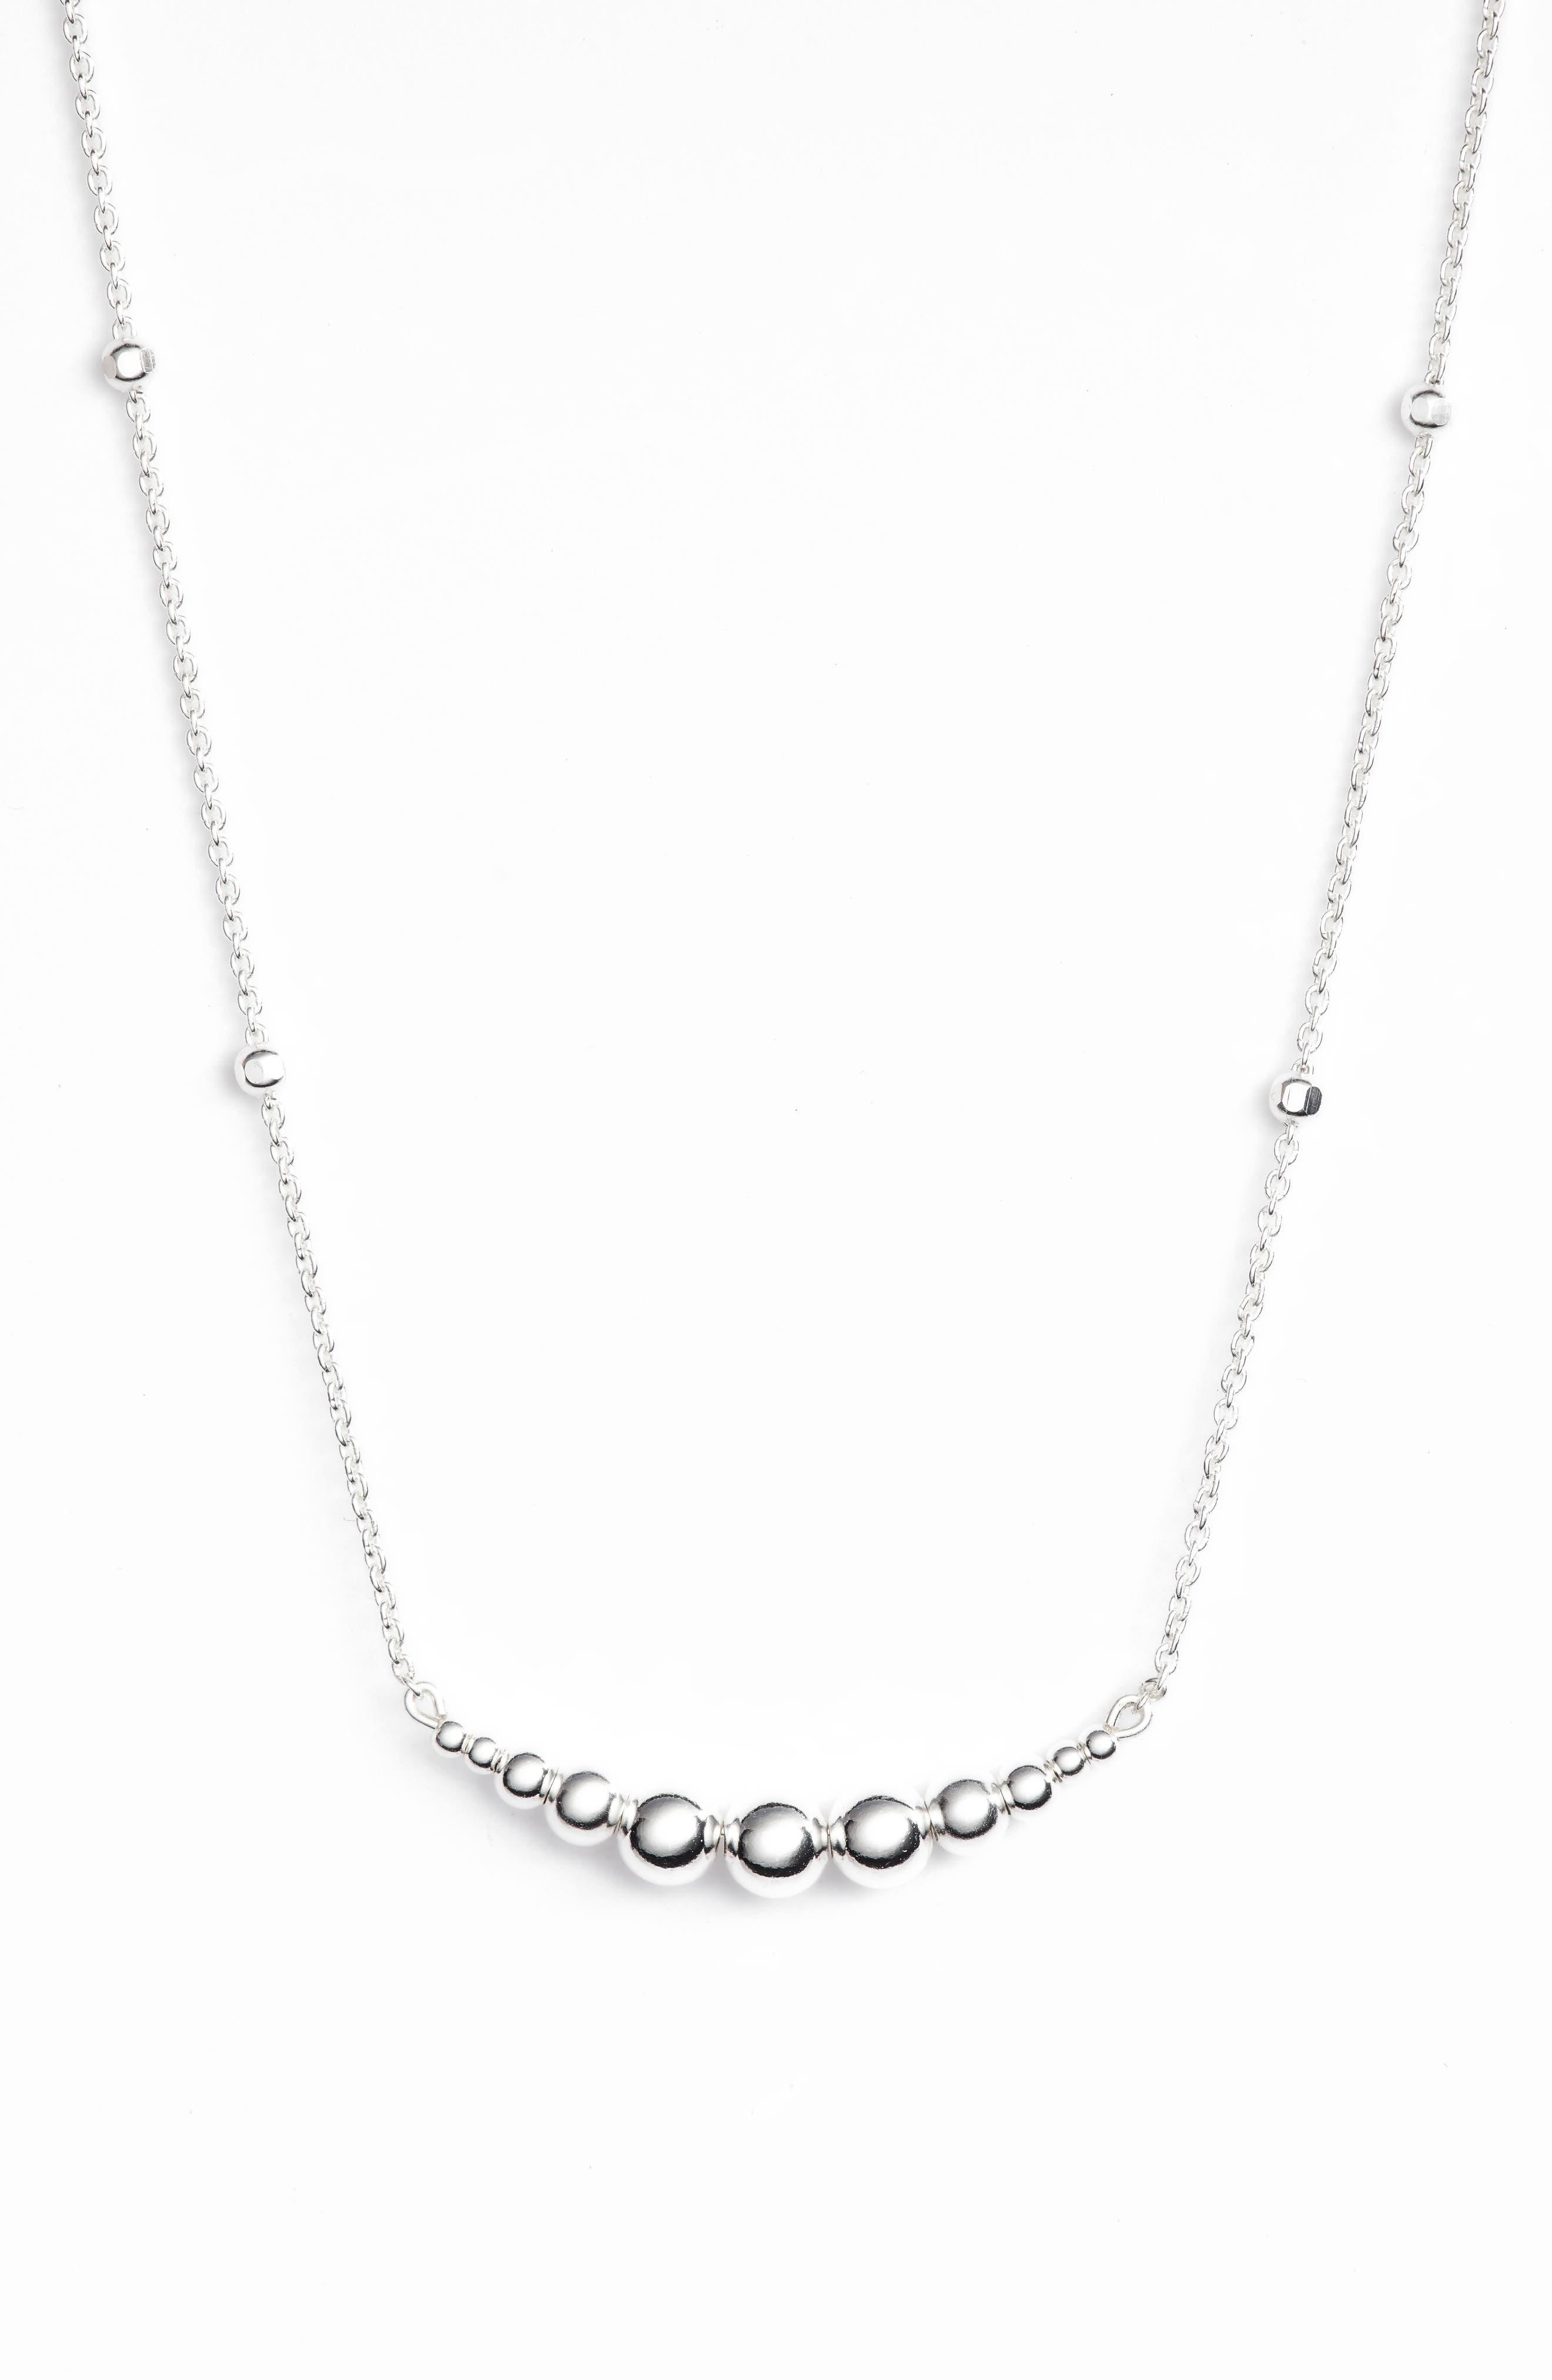 Graduated Sphere Pendant Necklace,                             Main thumbnail 1, color,                             SILVER